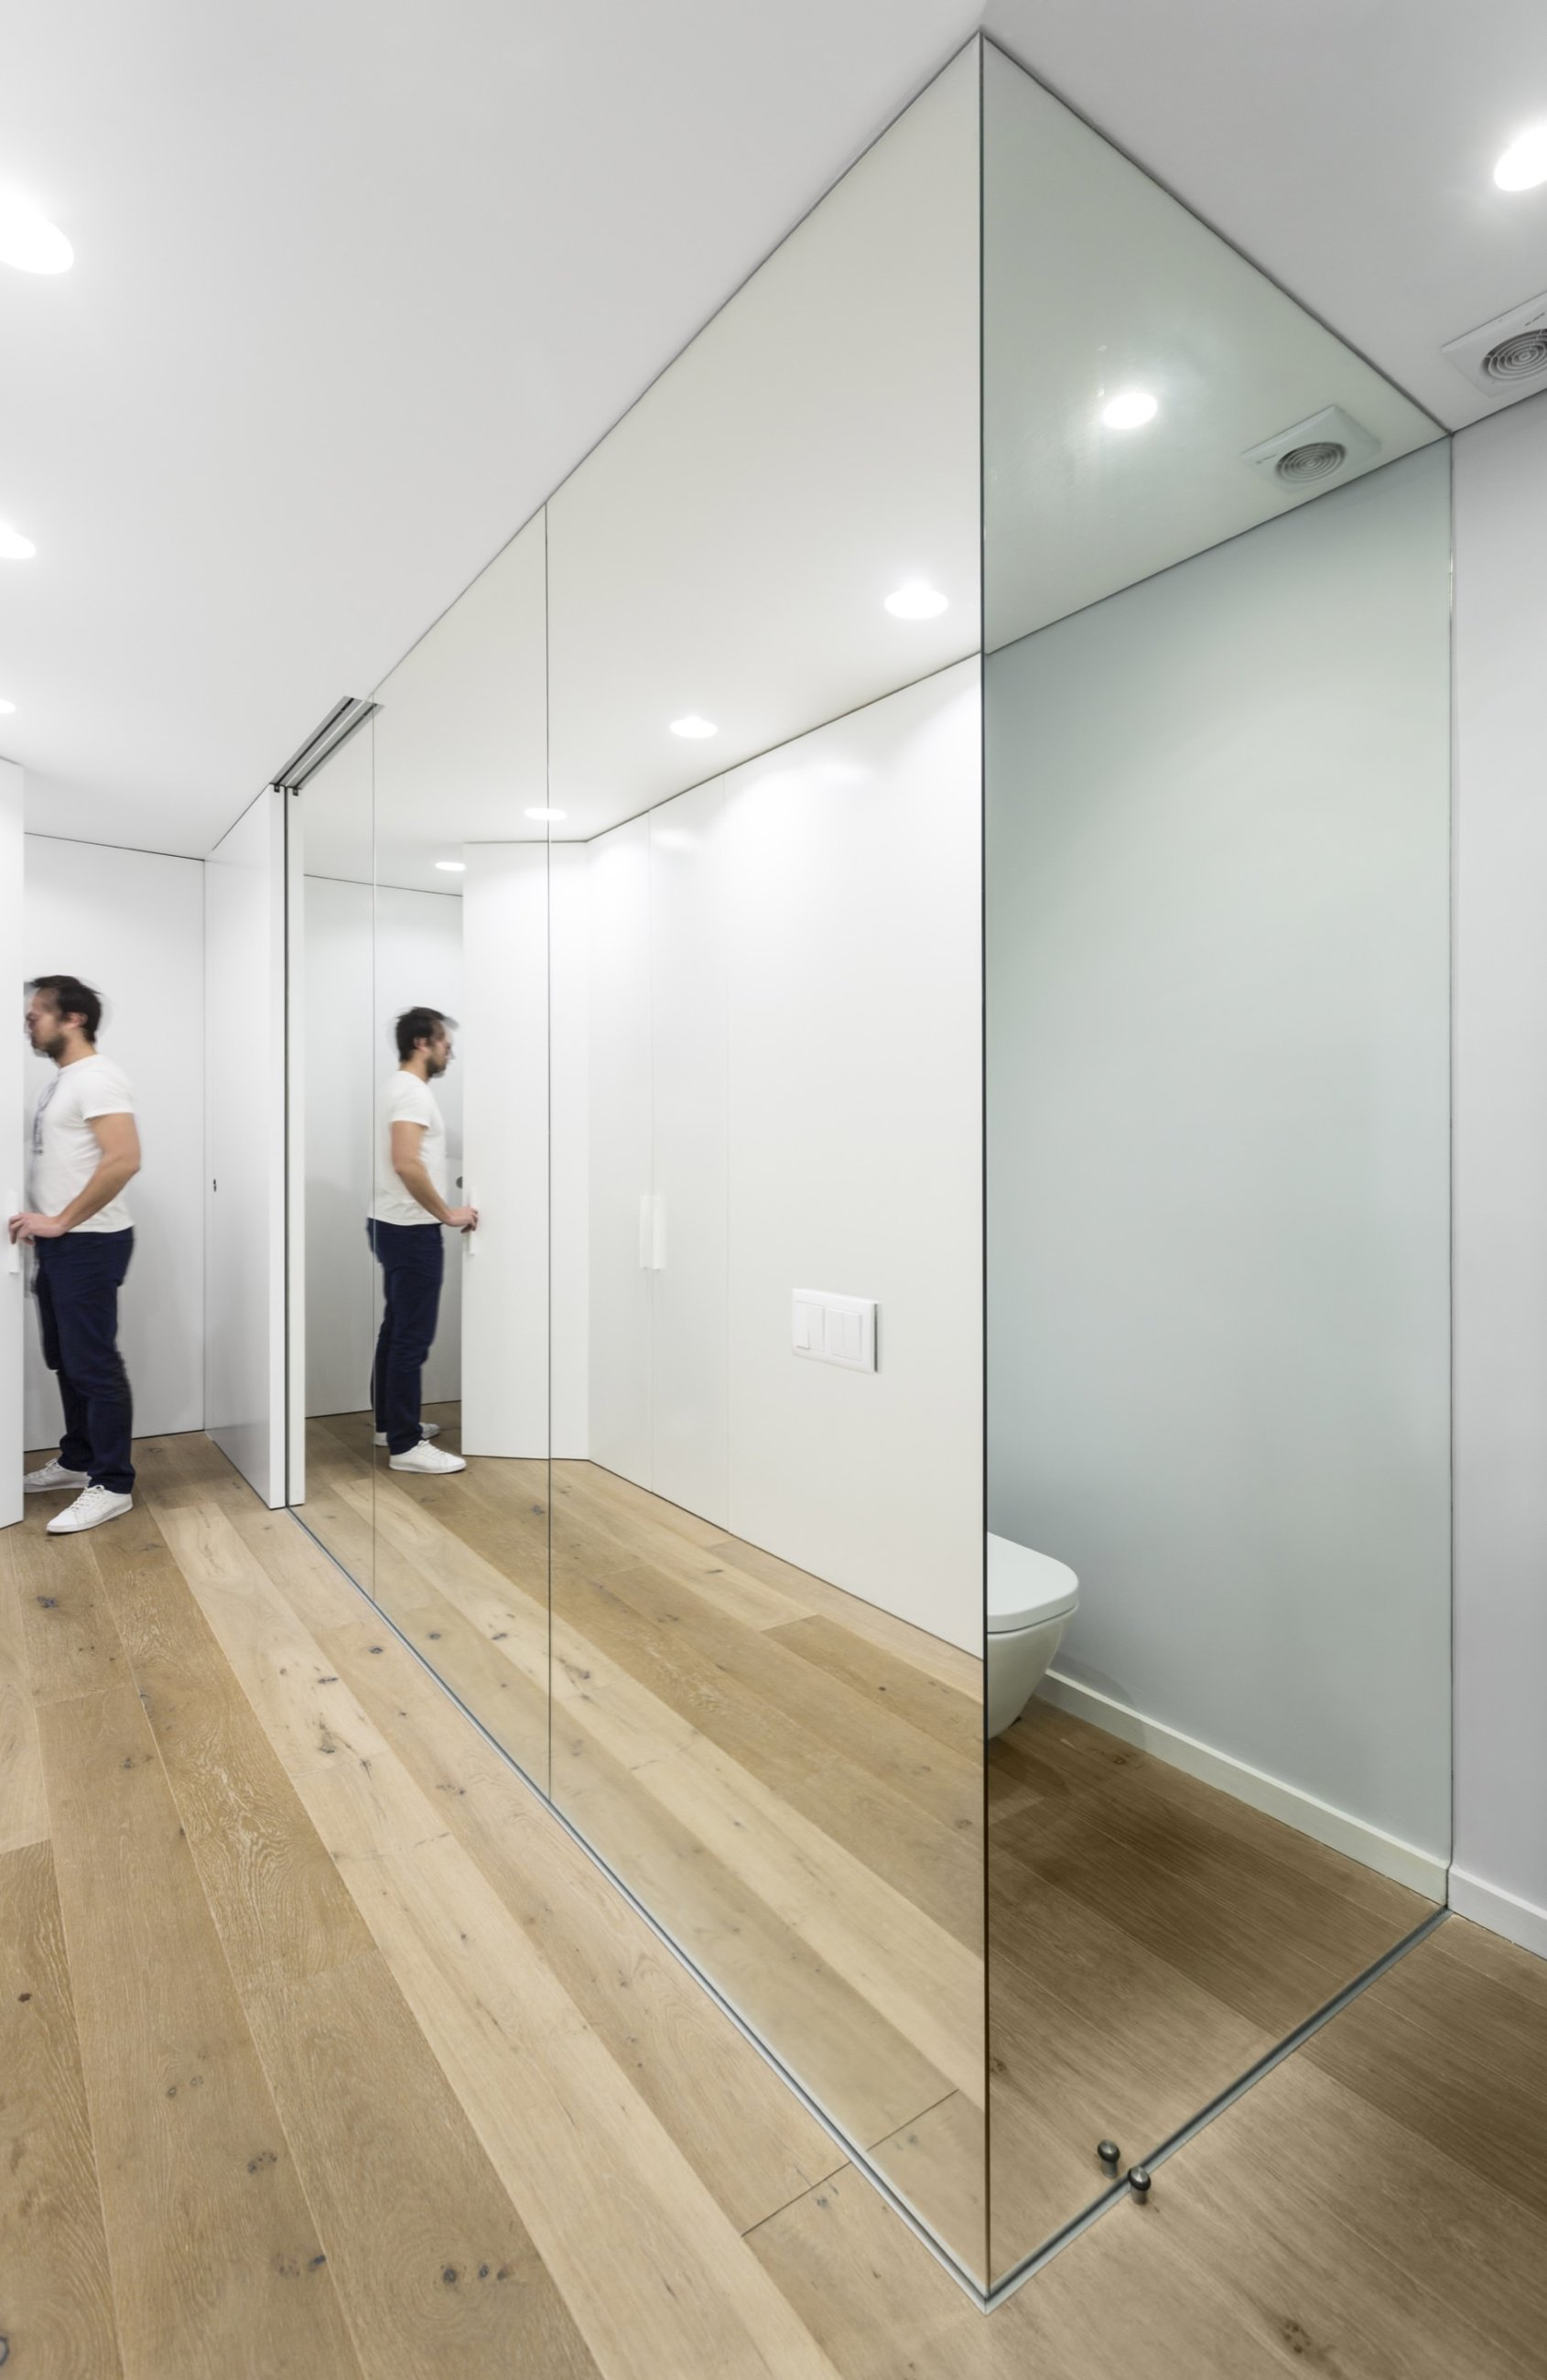 Apartamento Barcelona Arquitecto Paulo Martins 11 do fotografo Ivo Tavares Studio